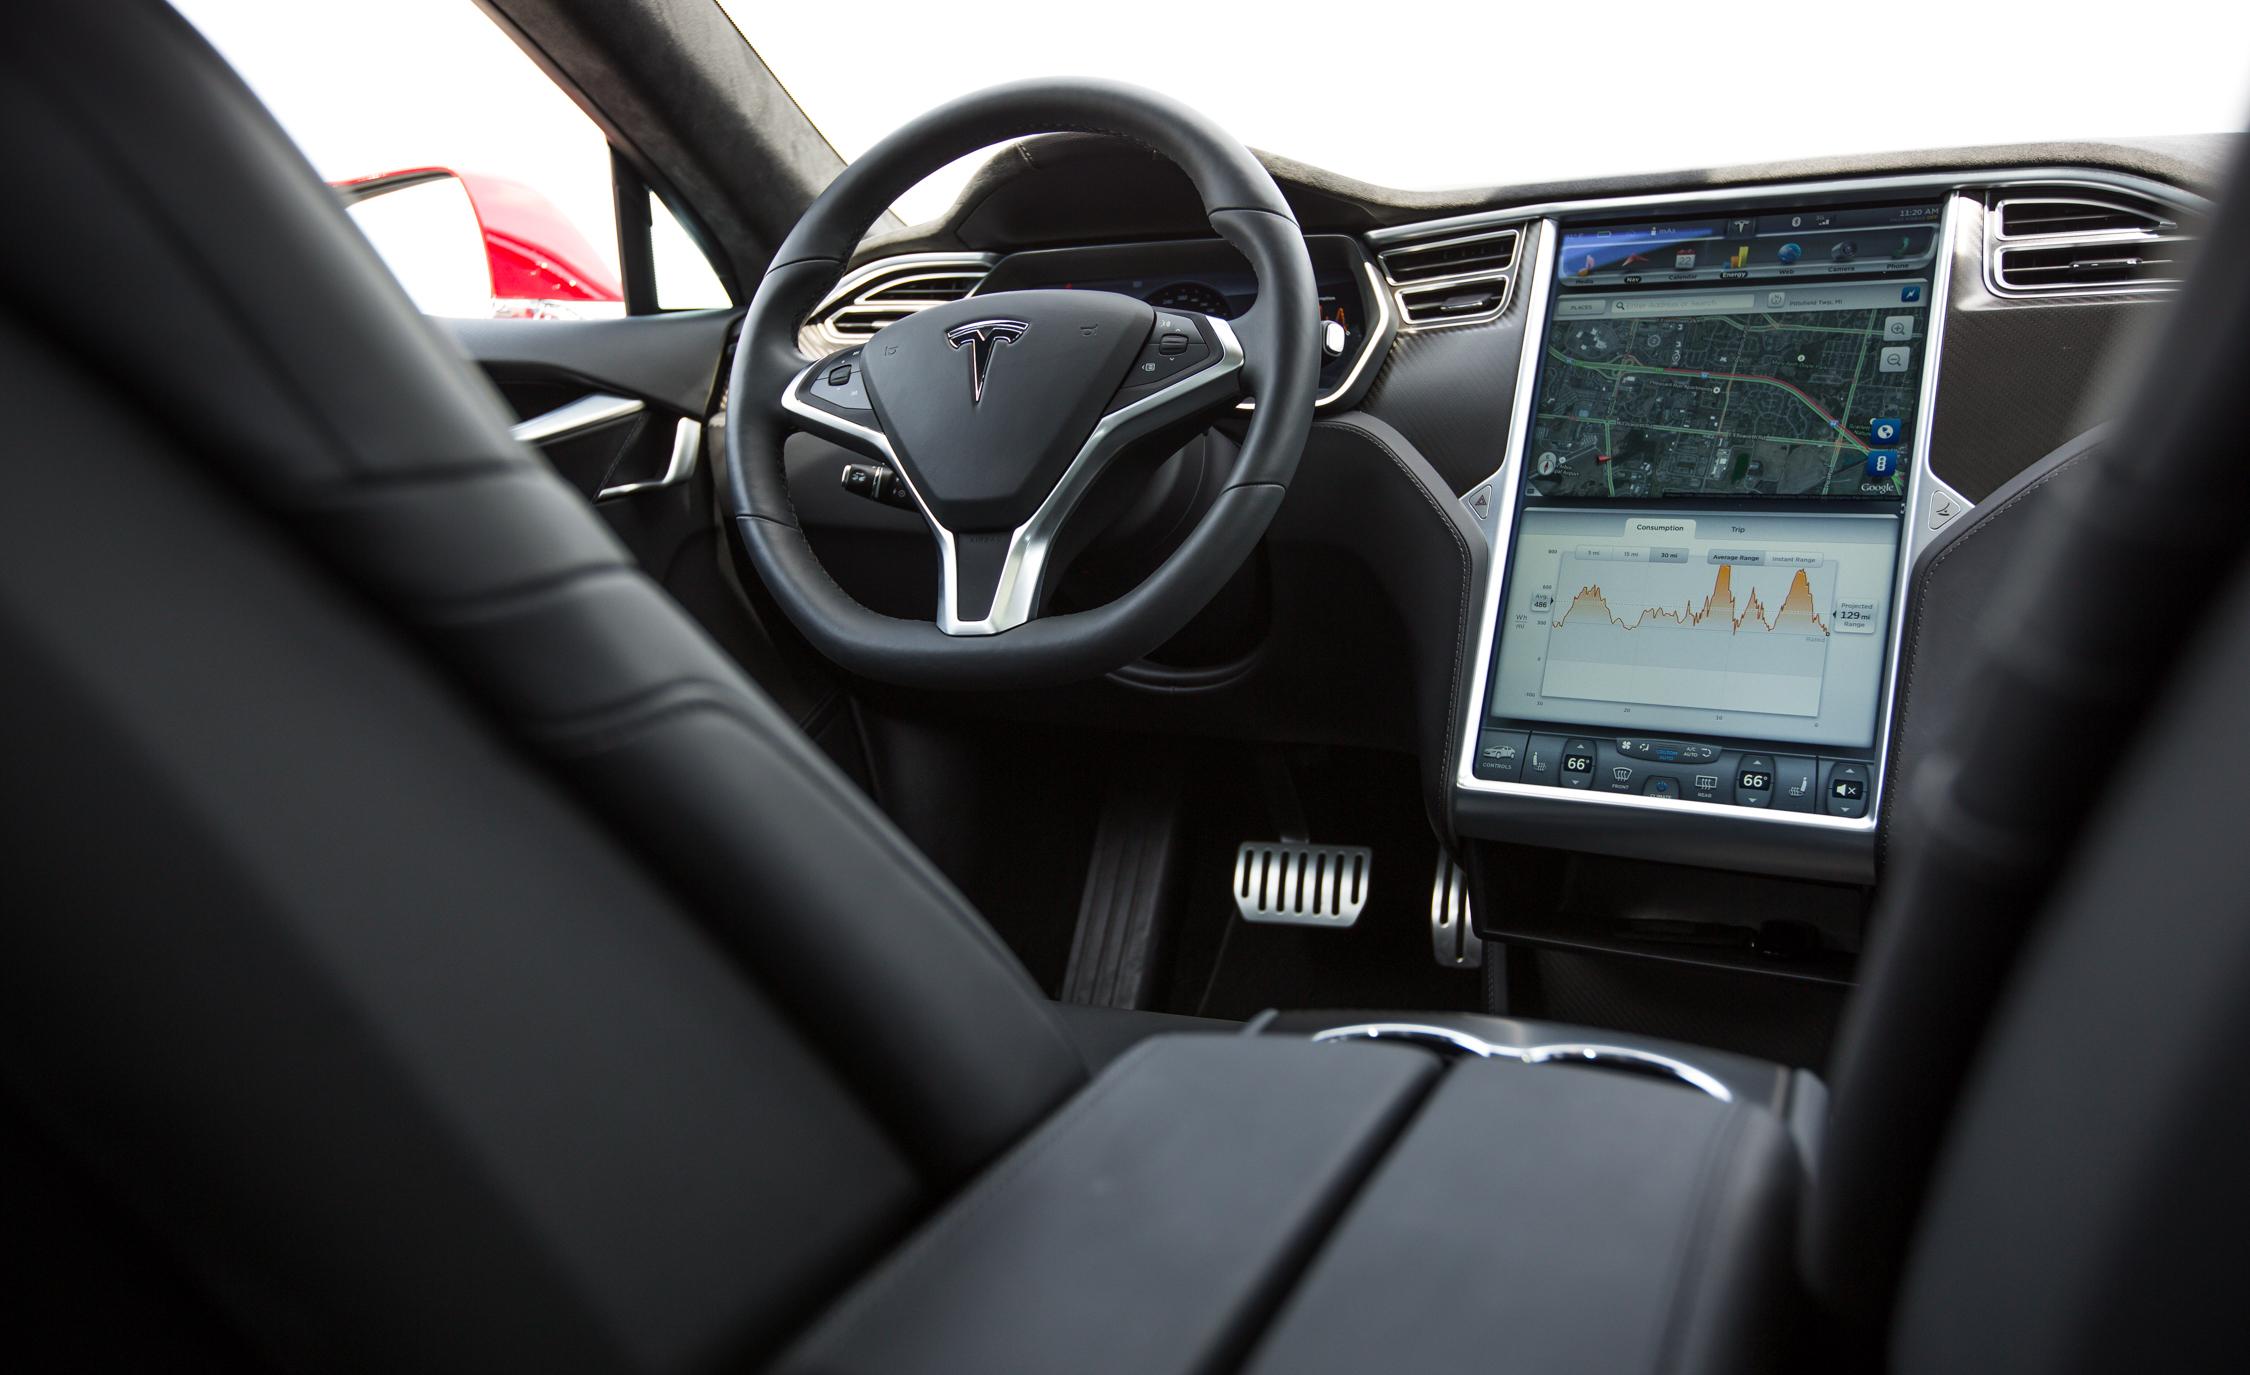 2015 Tesla Model S P85D Cockpit and Head Unit